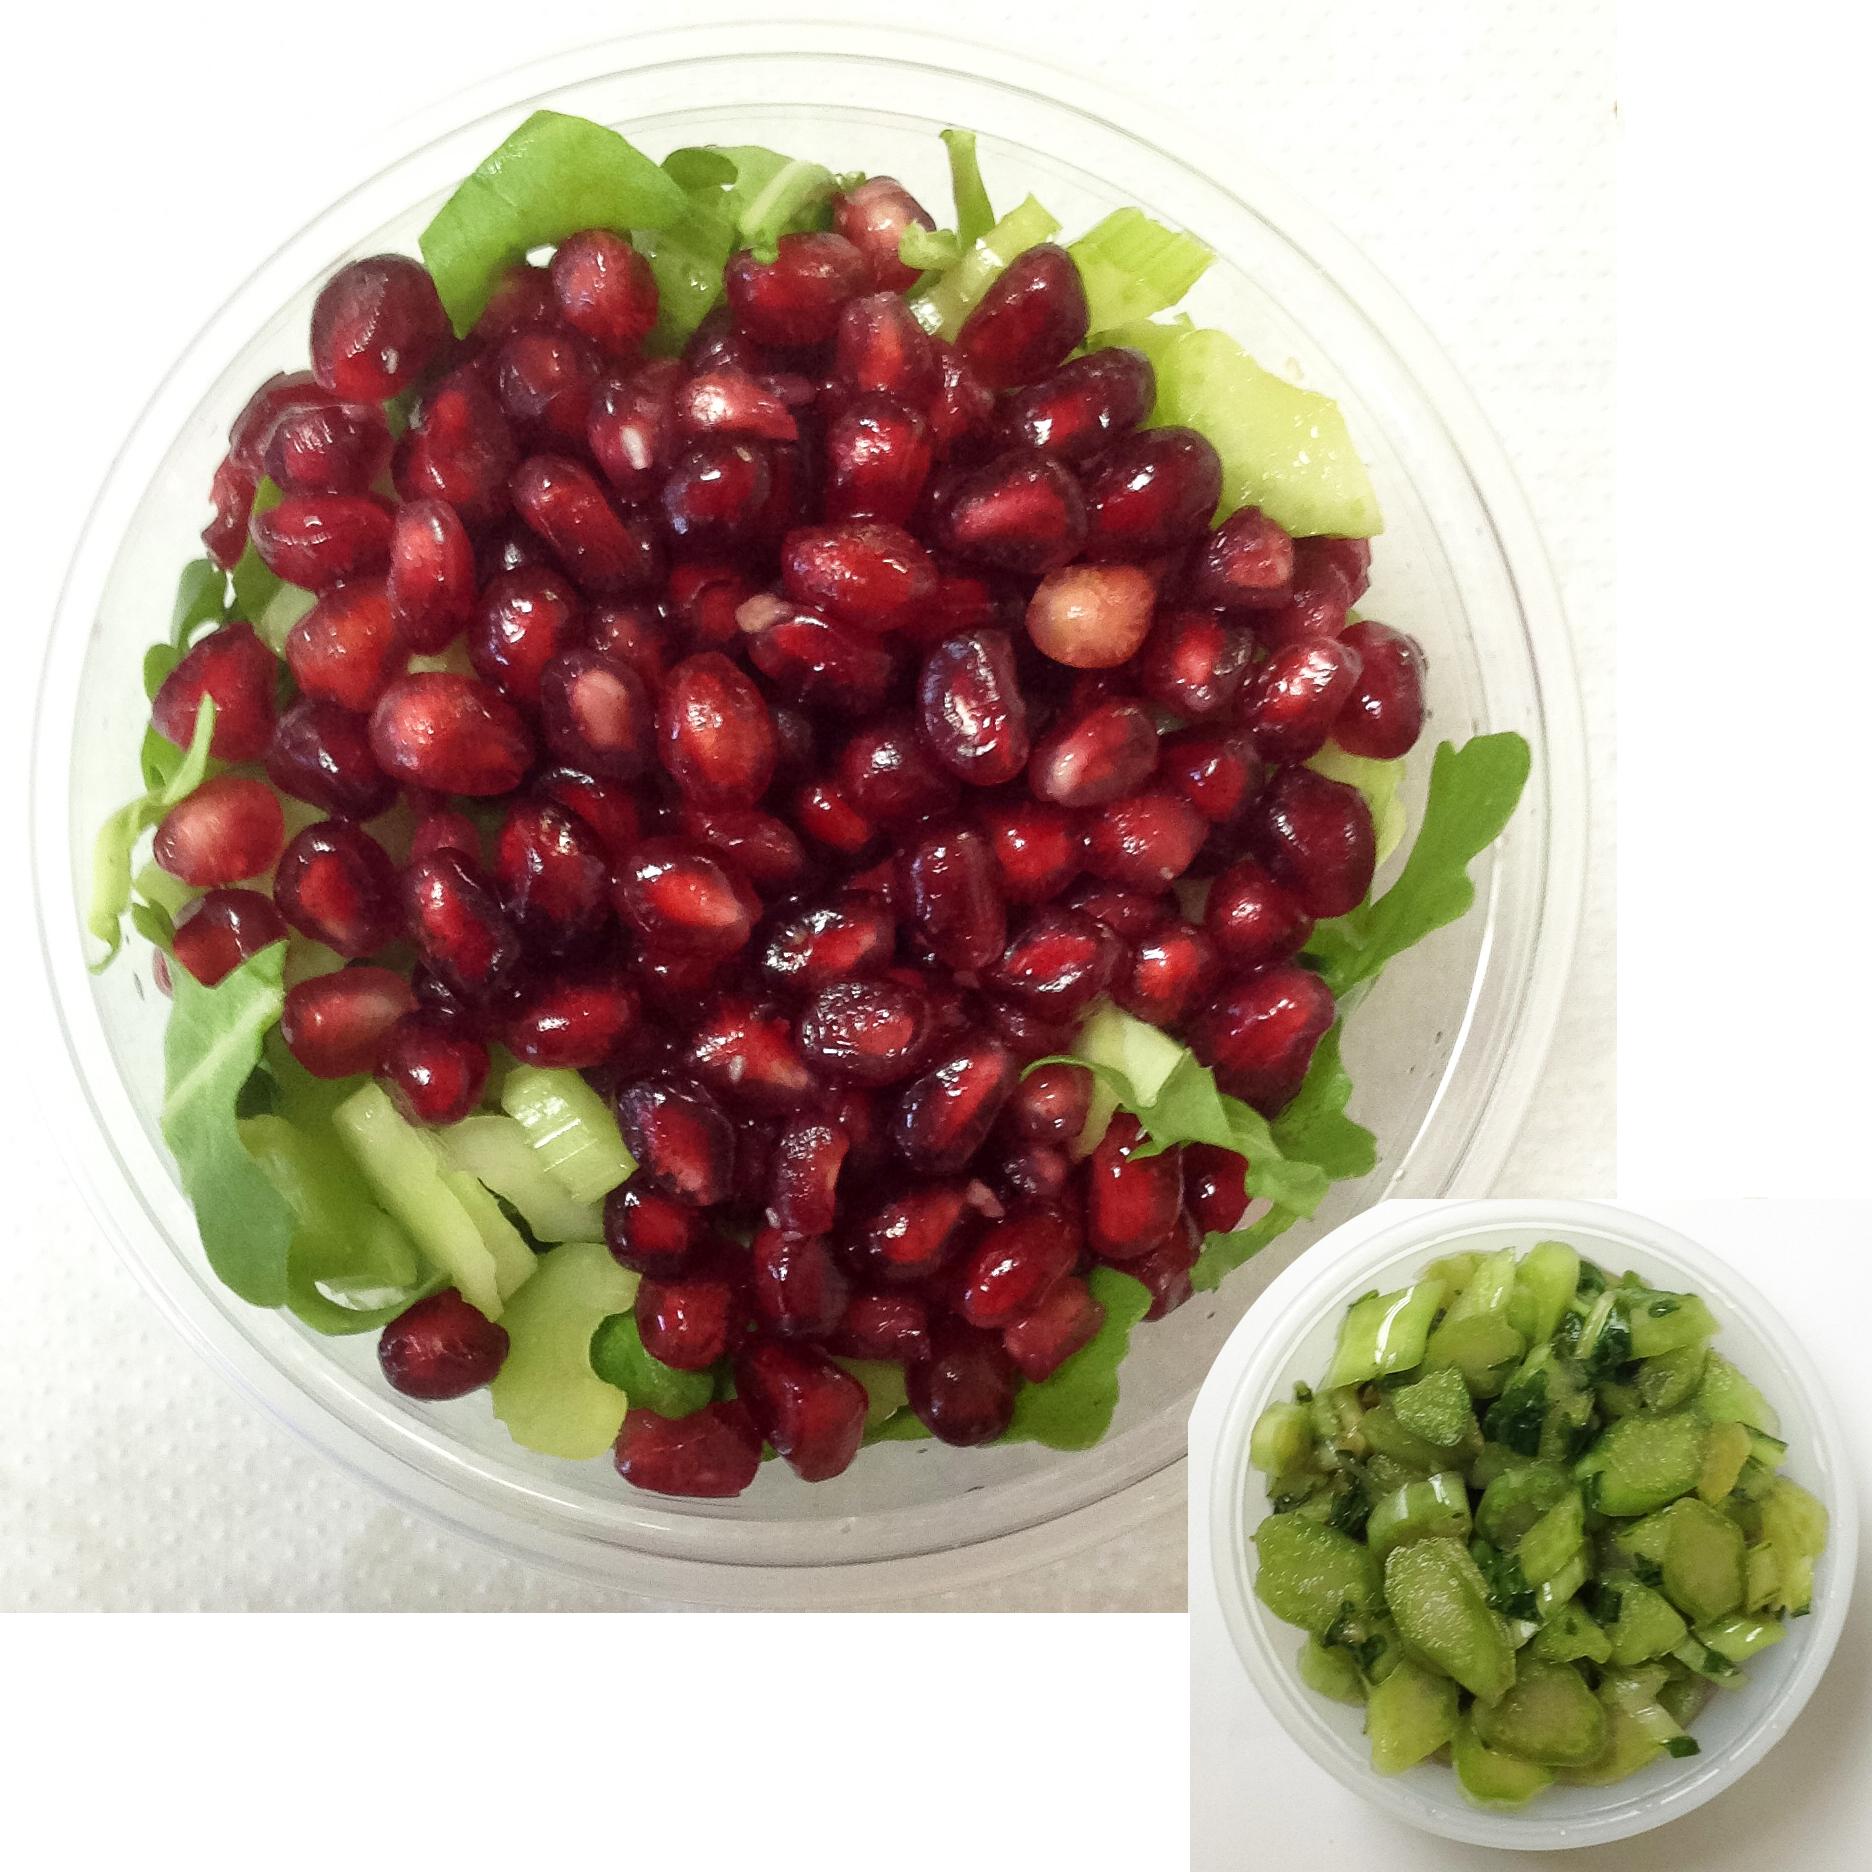 arugula-and-pomegranate